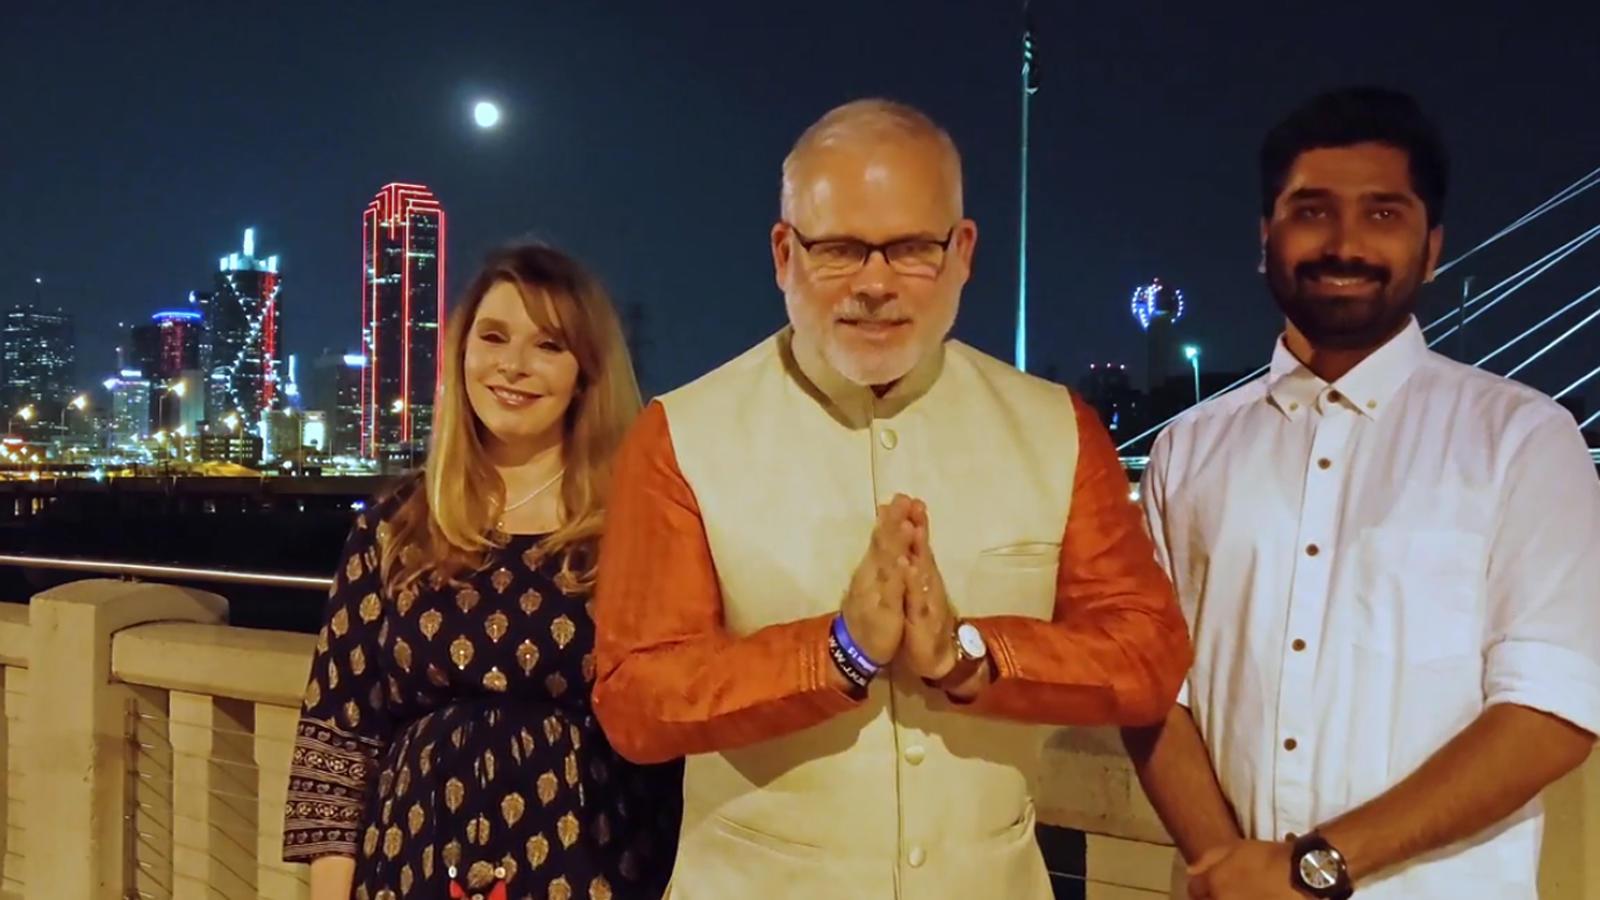 howdymodi-folks-give-special-message-for-pm-narendra-modi-from-dallas